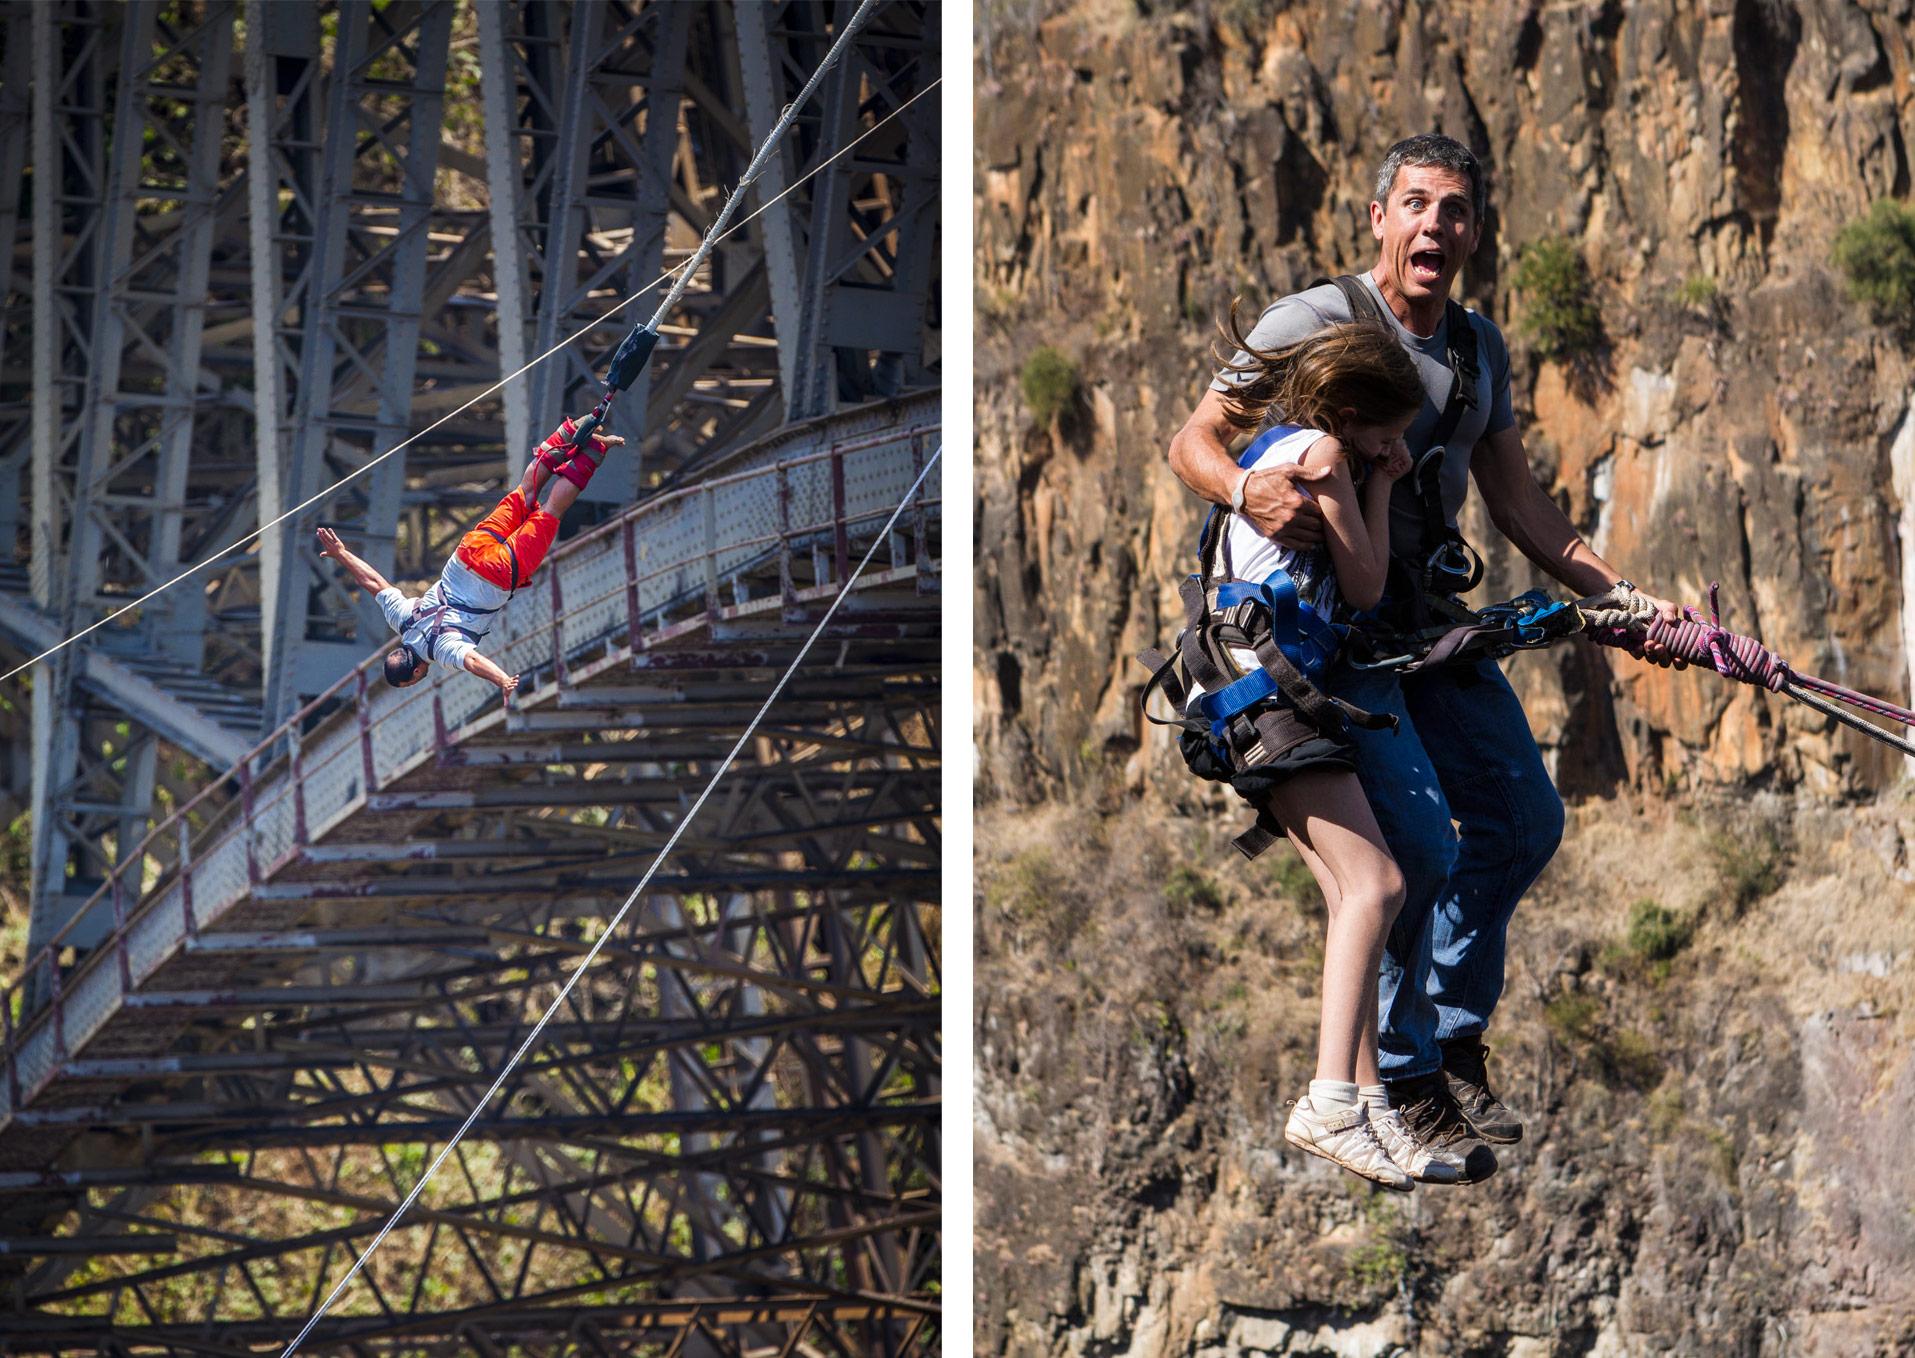 bungee jumping gorge swing vic falls